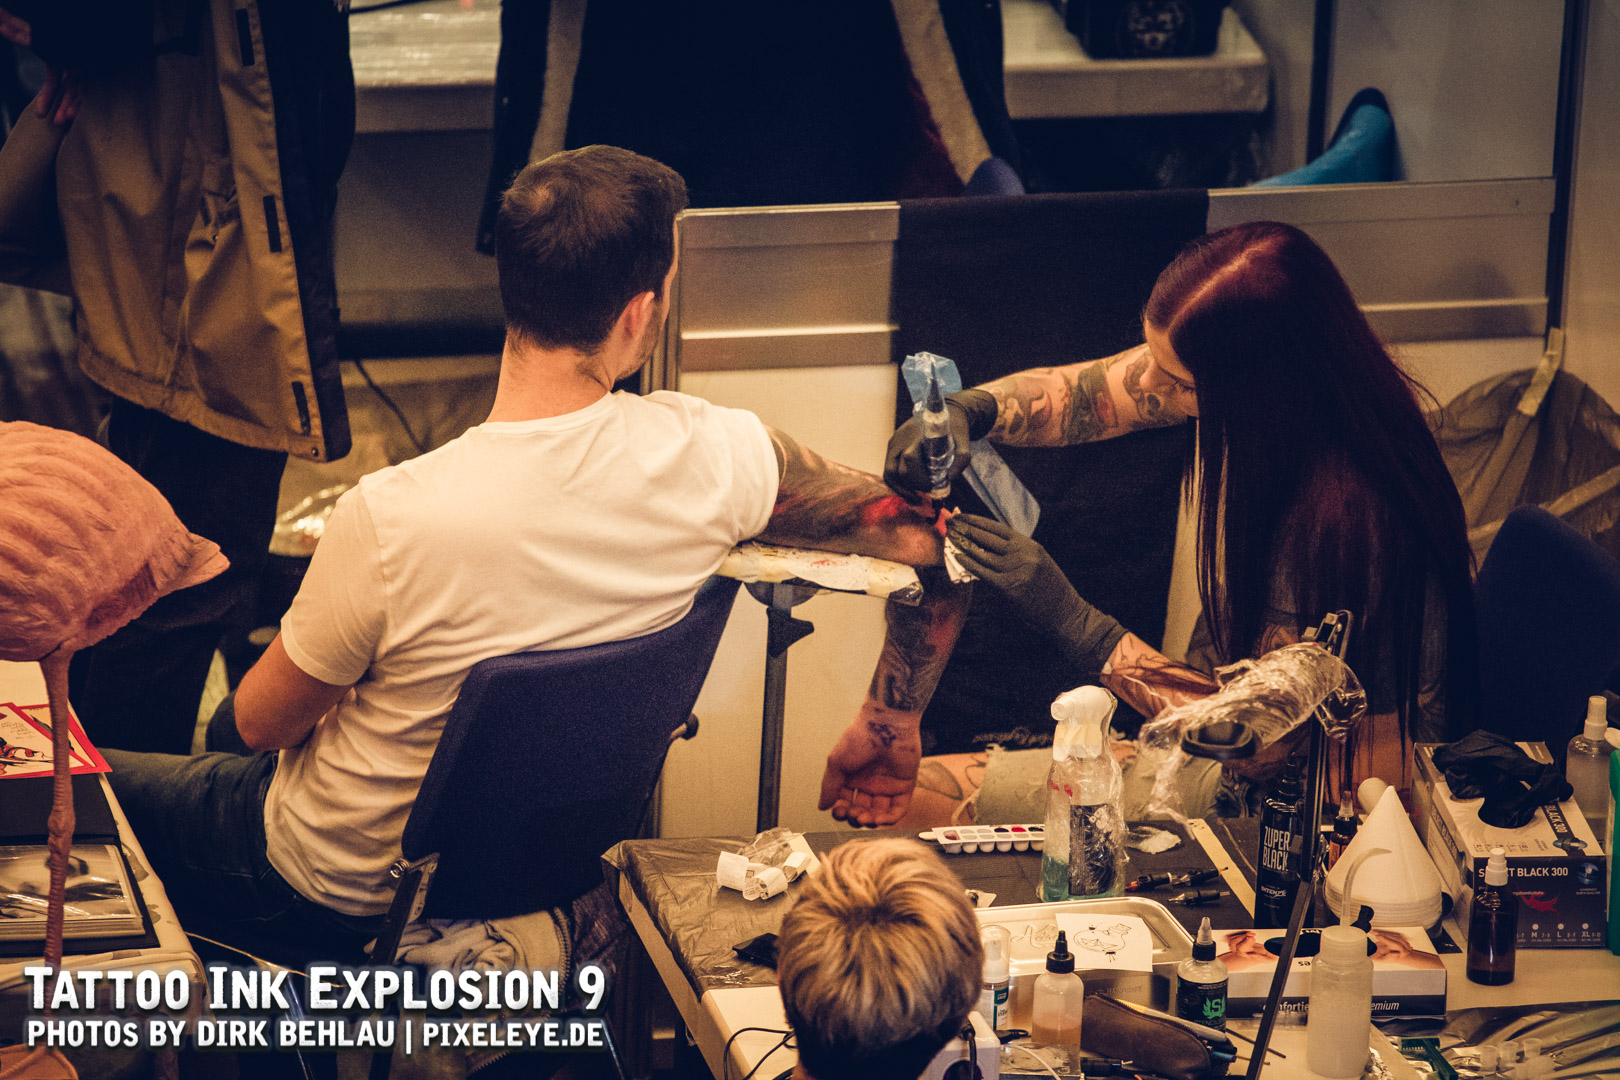 Tattoo Ink Explosion 2018 WEB by Dirk Behlau-1422.jpg